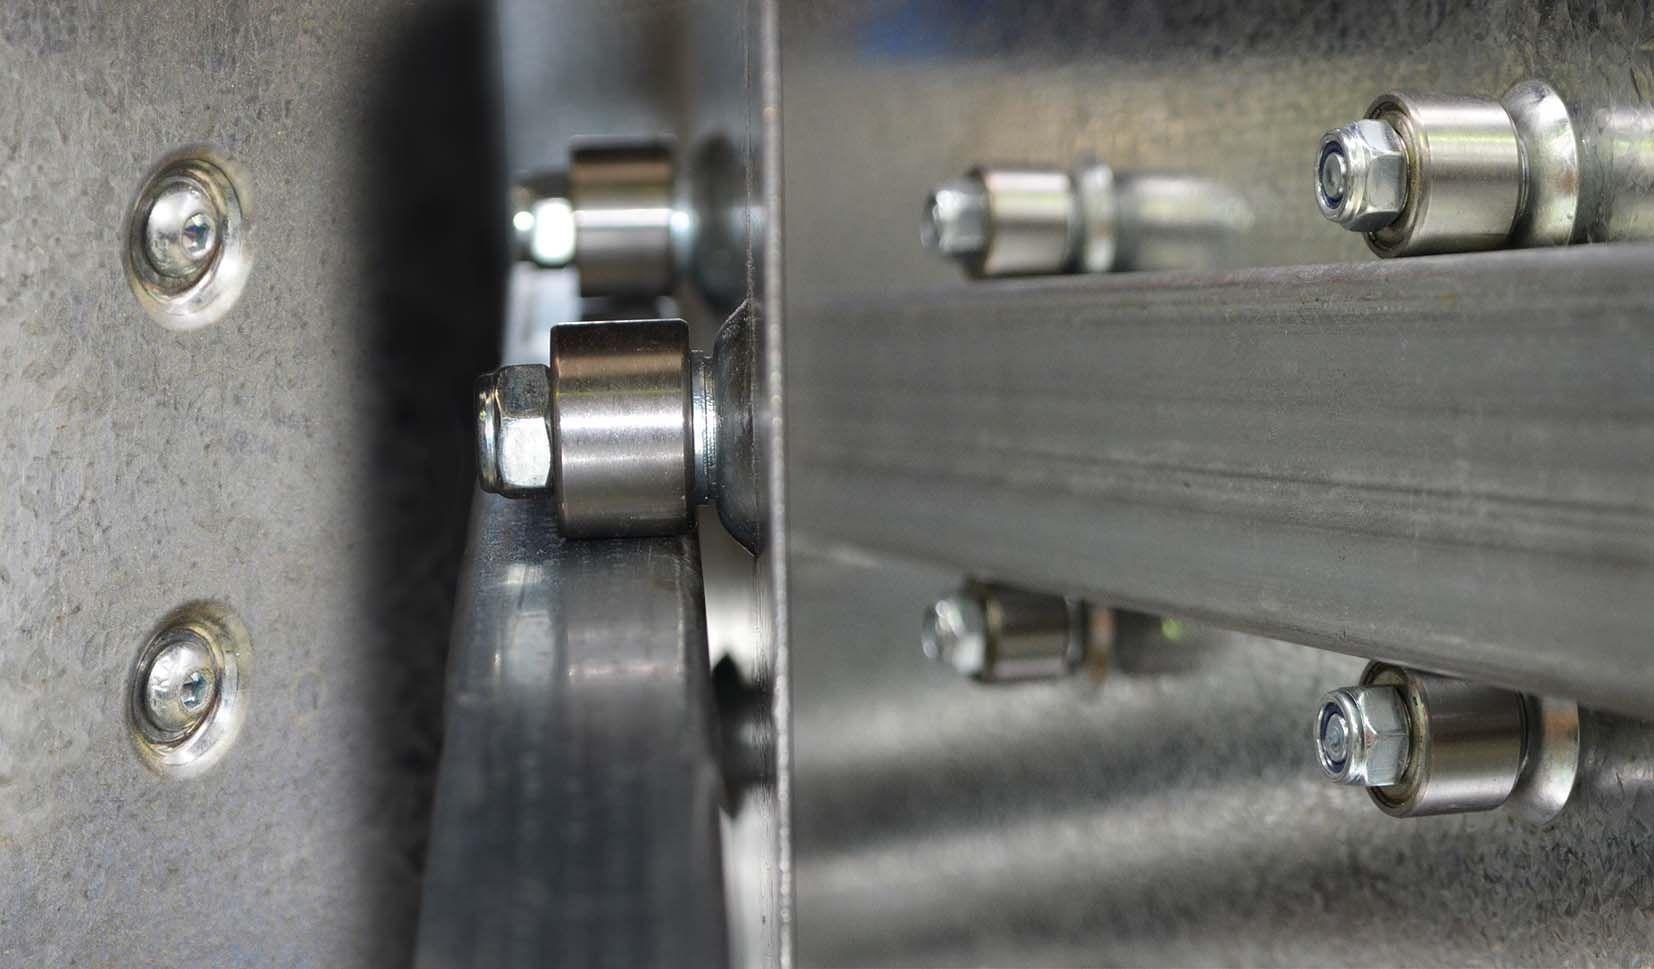 Drawers Commercial Heavy Duty Drawer Slides Drawer Slides Truck Bed Slide